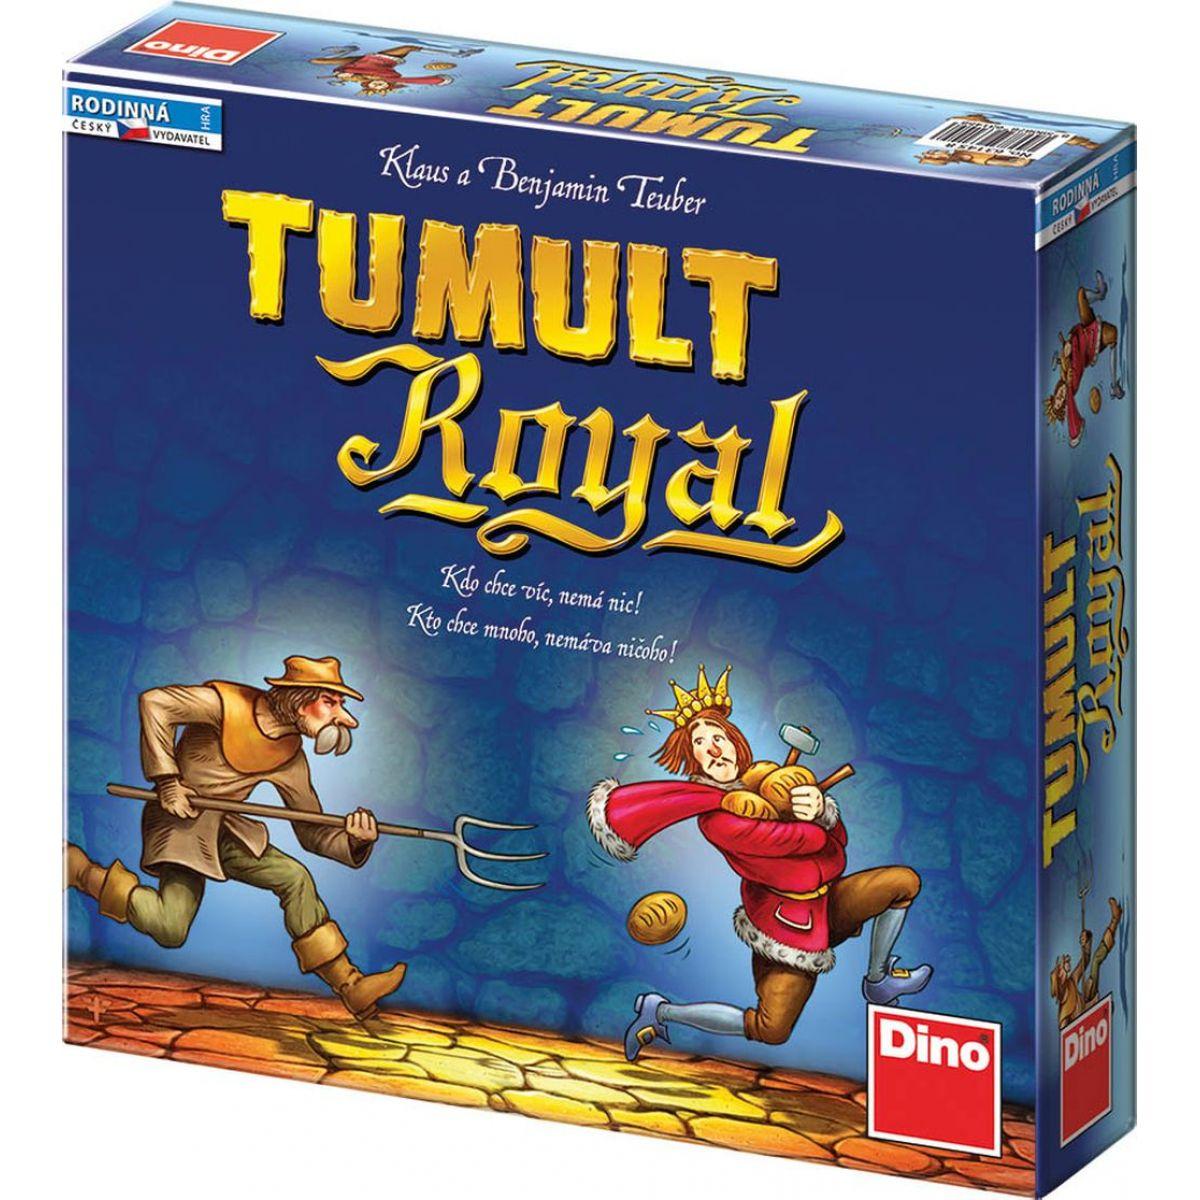 Dino Tumult Royal